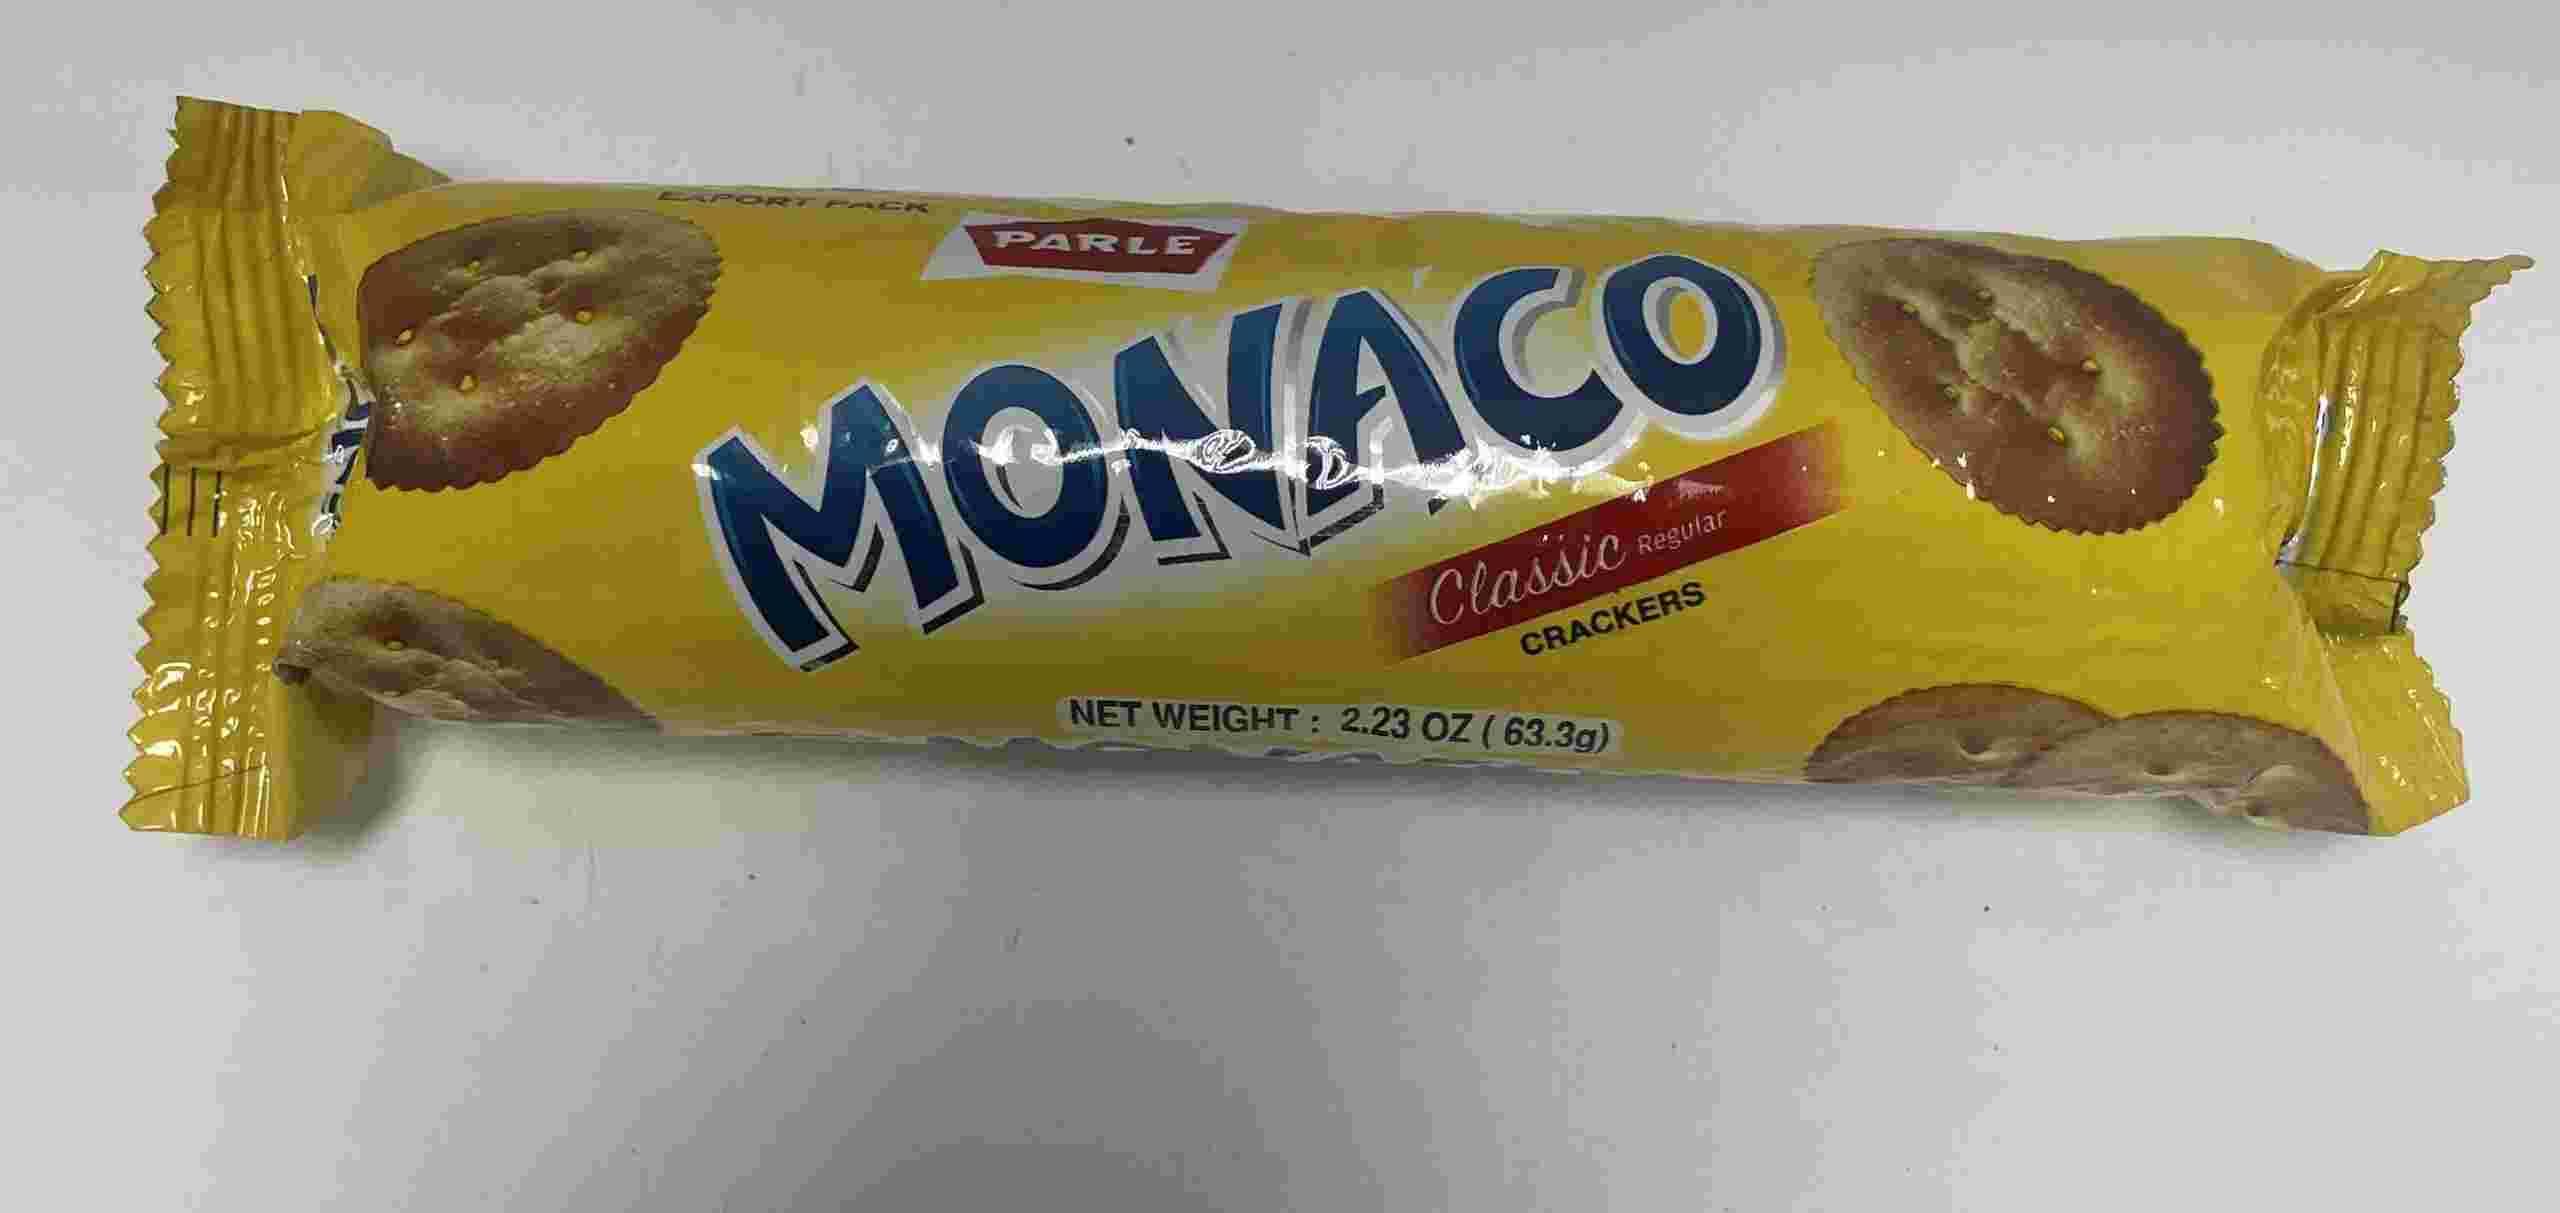 Parle Monaco